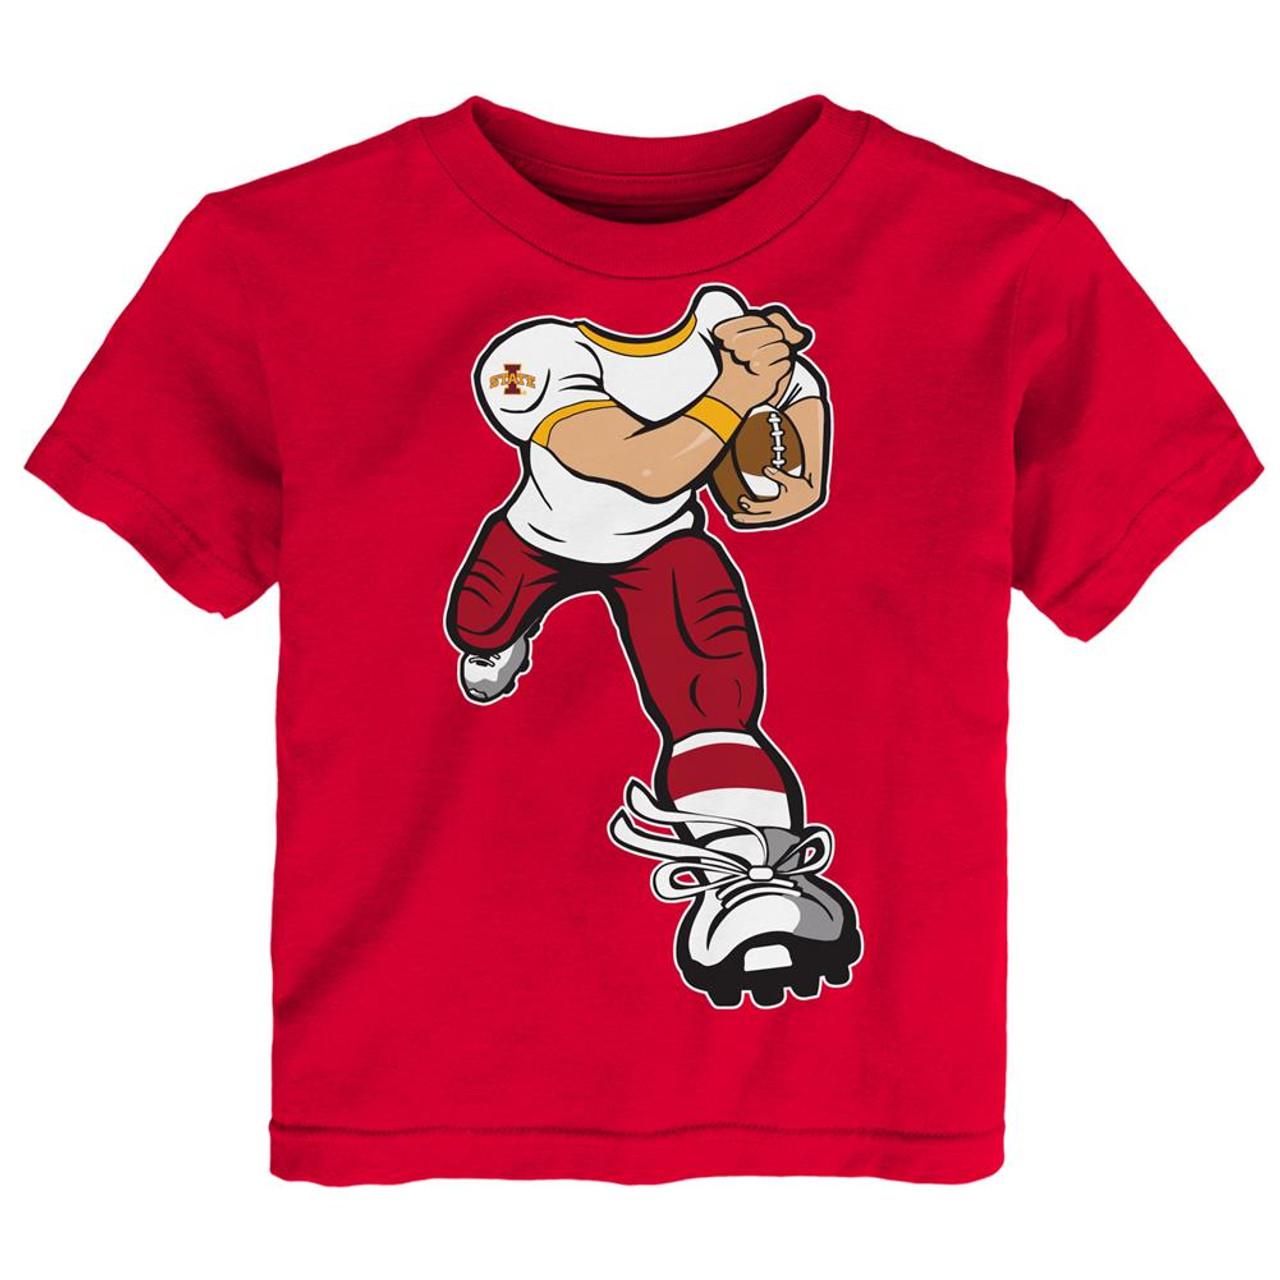 Toddler Iowa State Cyclones Tee Yard Rush Toddler T-Shirt